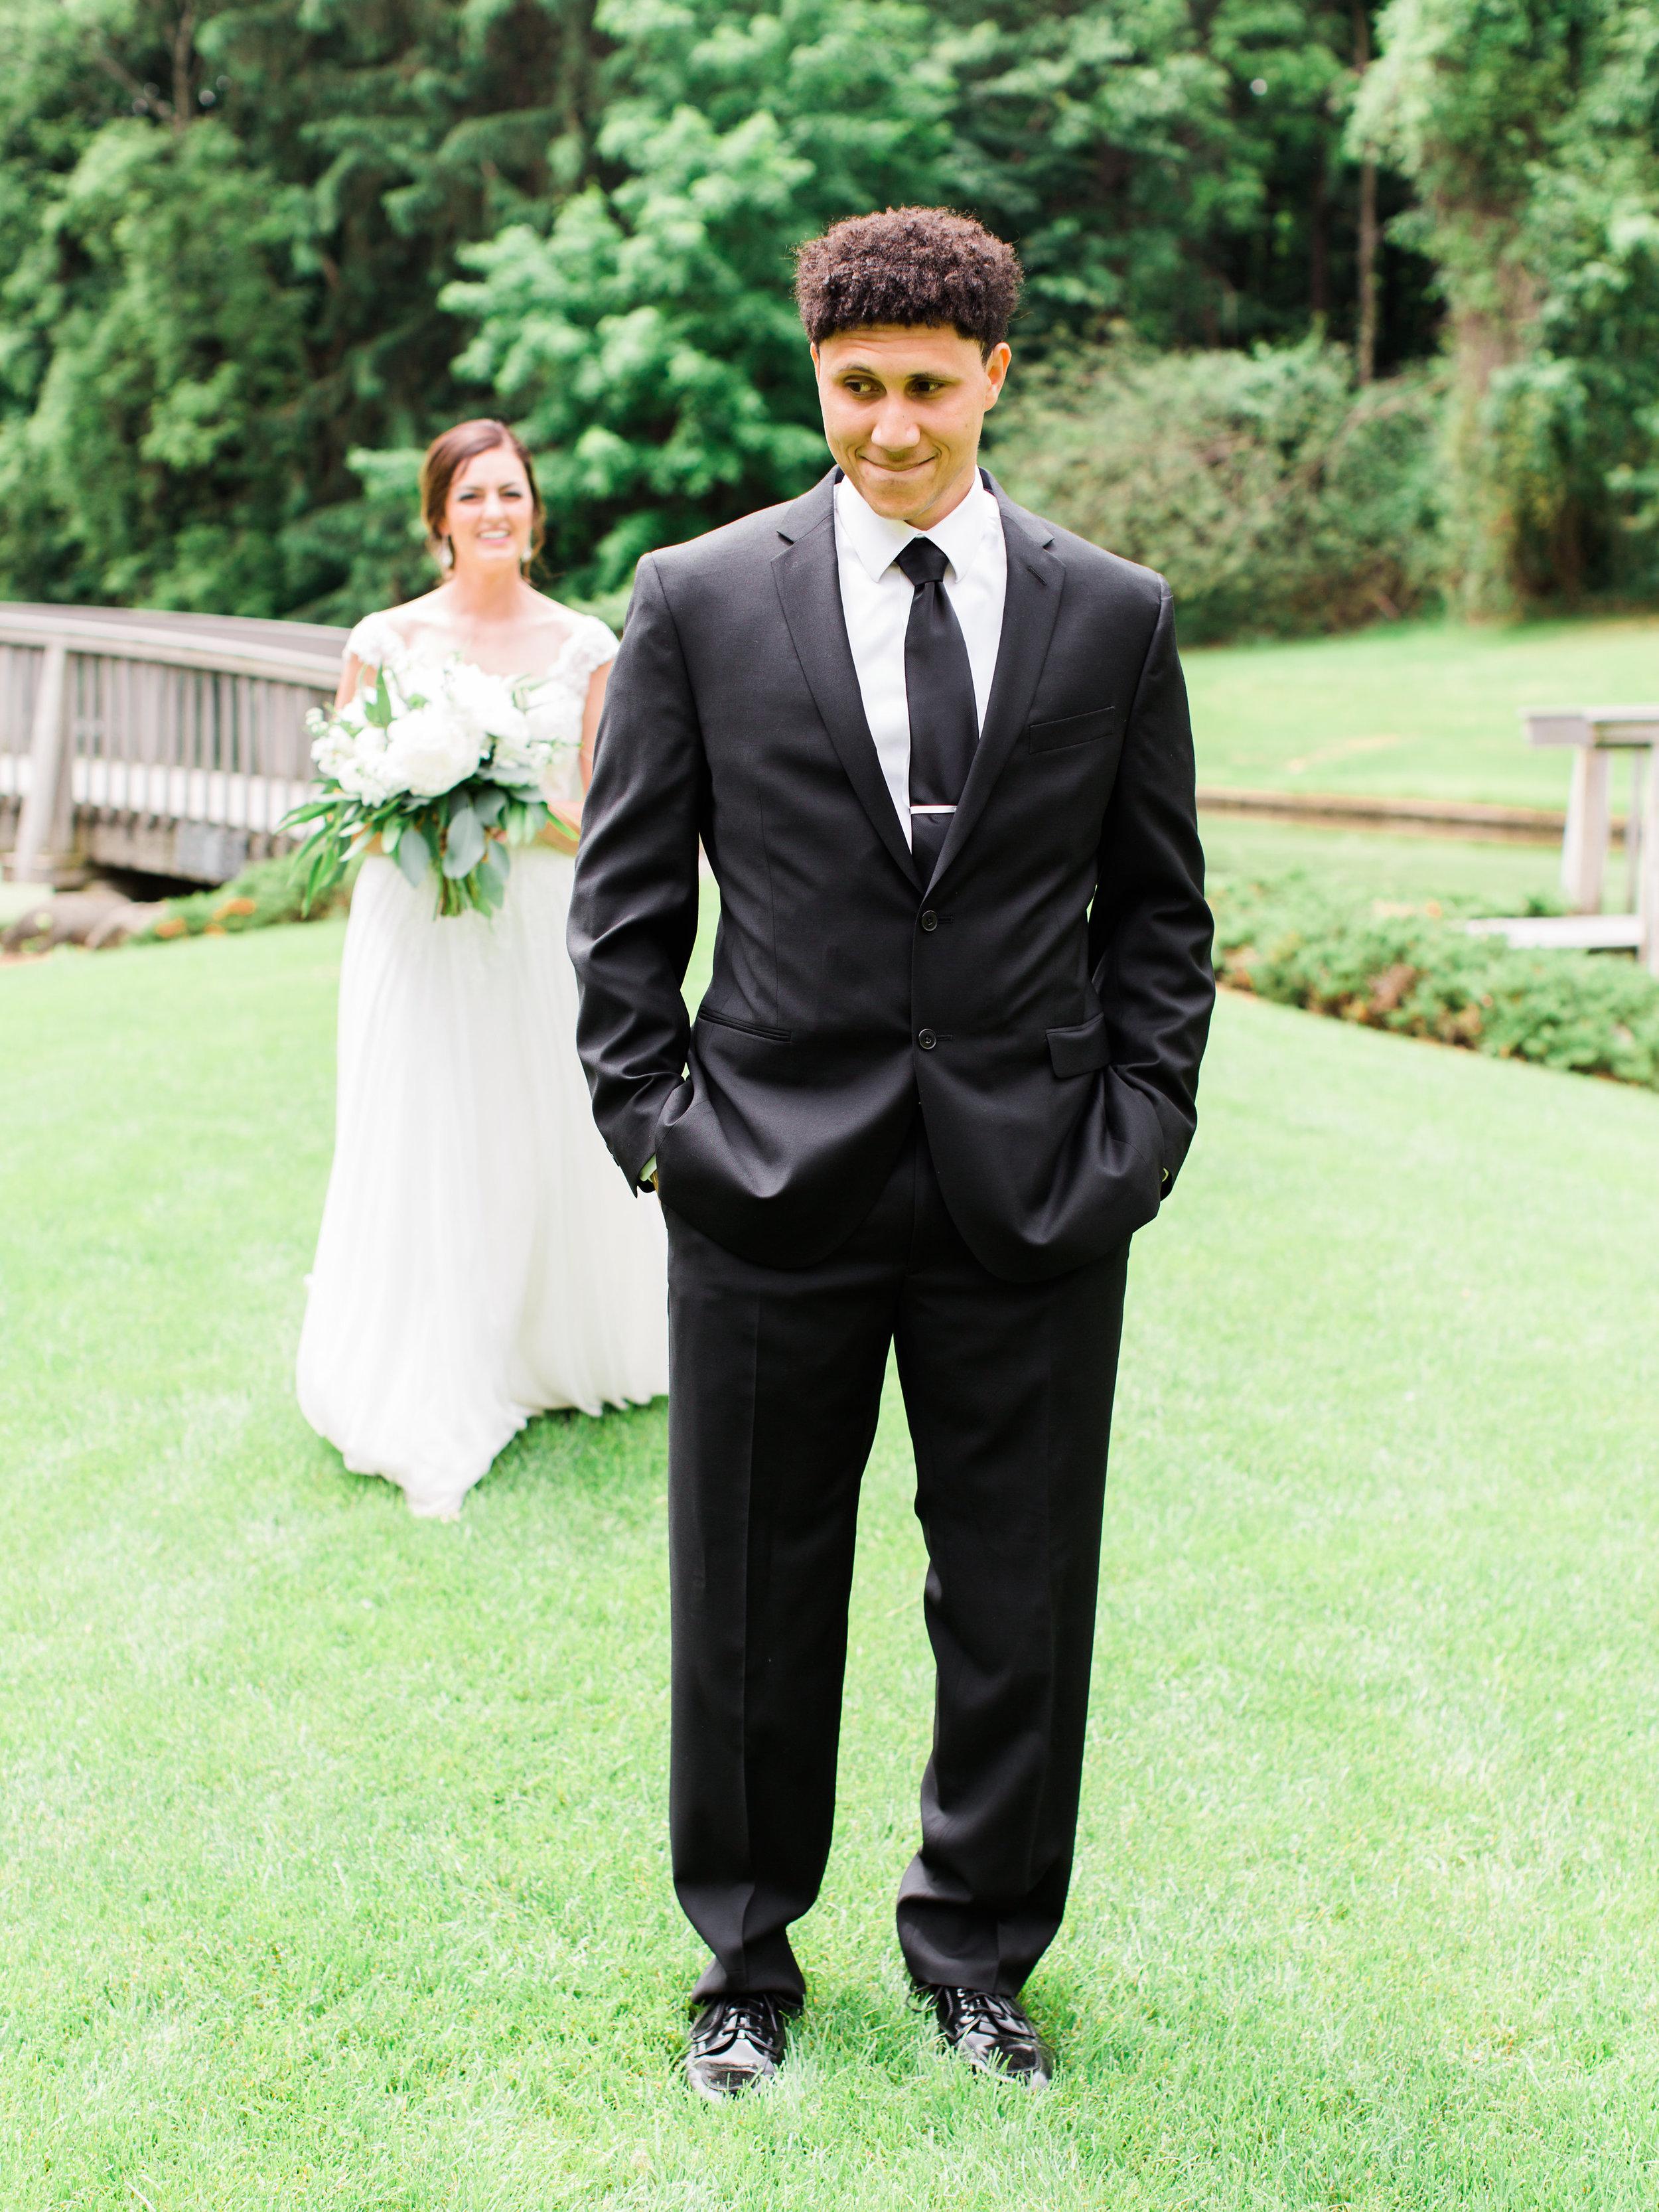 Julius+Wedding+FirstLook-5.jpg